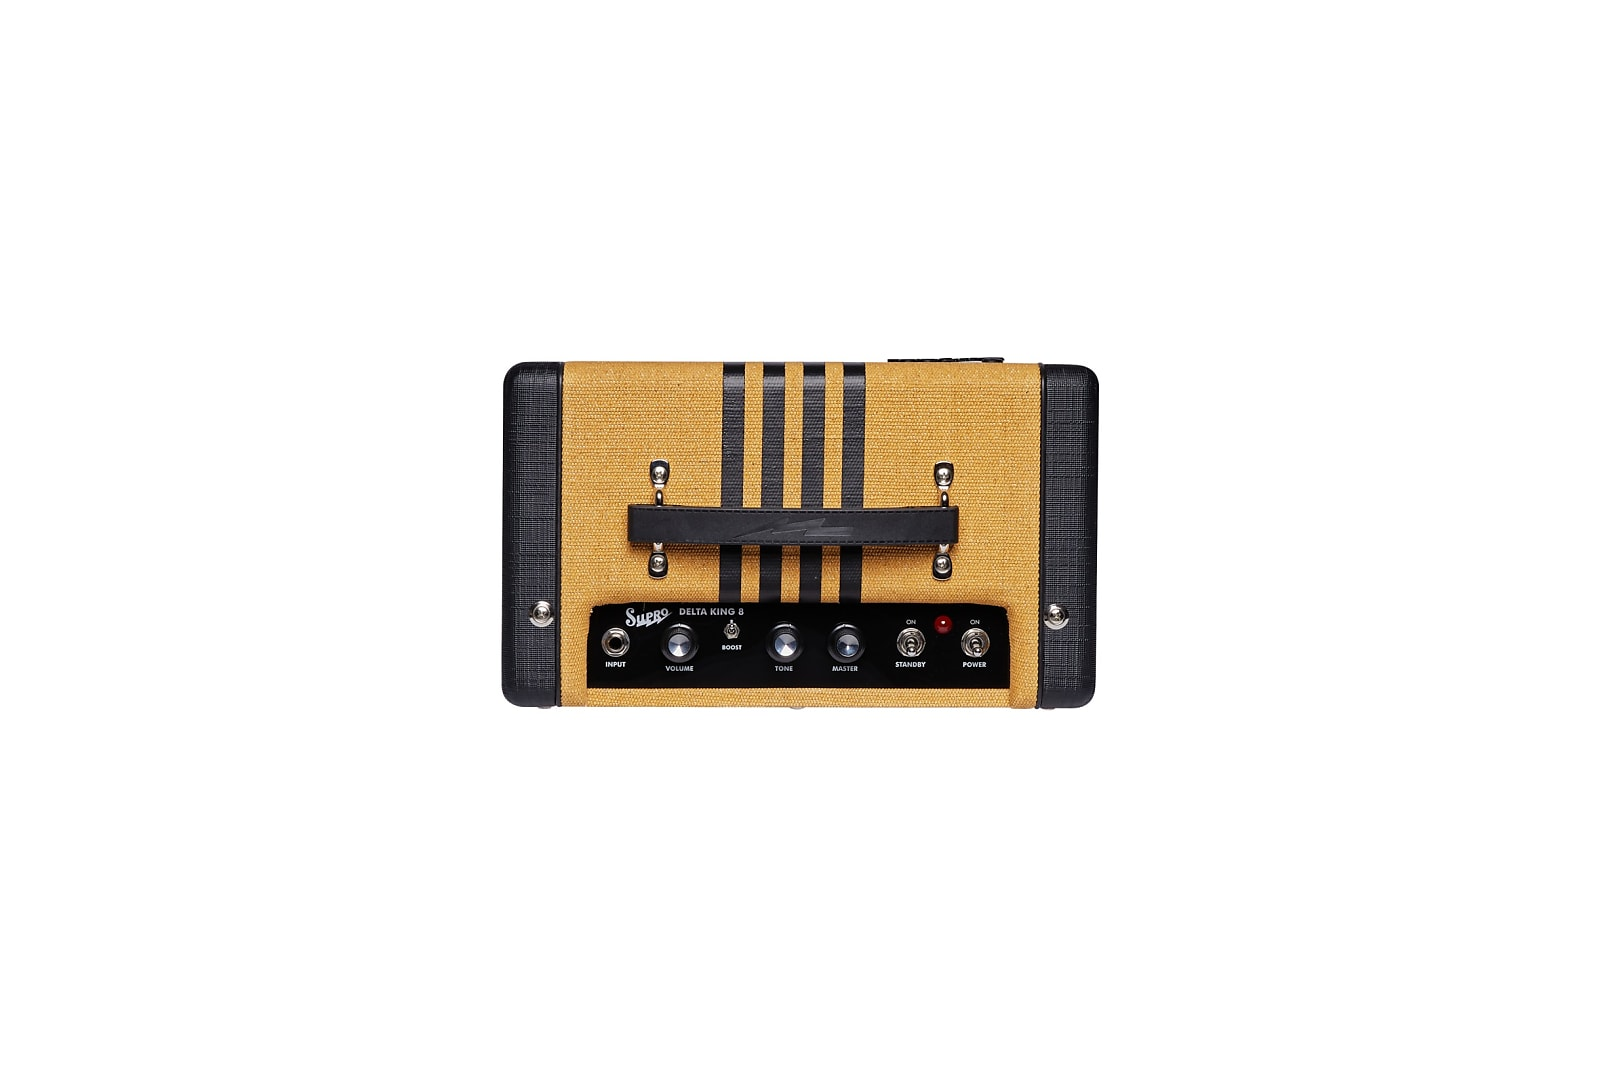 Supro 1818TB Delta King 8 1W 1x8'' Guitar Tube Combo Amplifier Tweed & Black